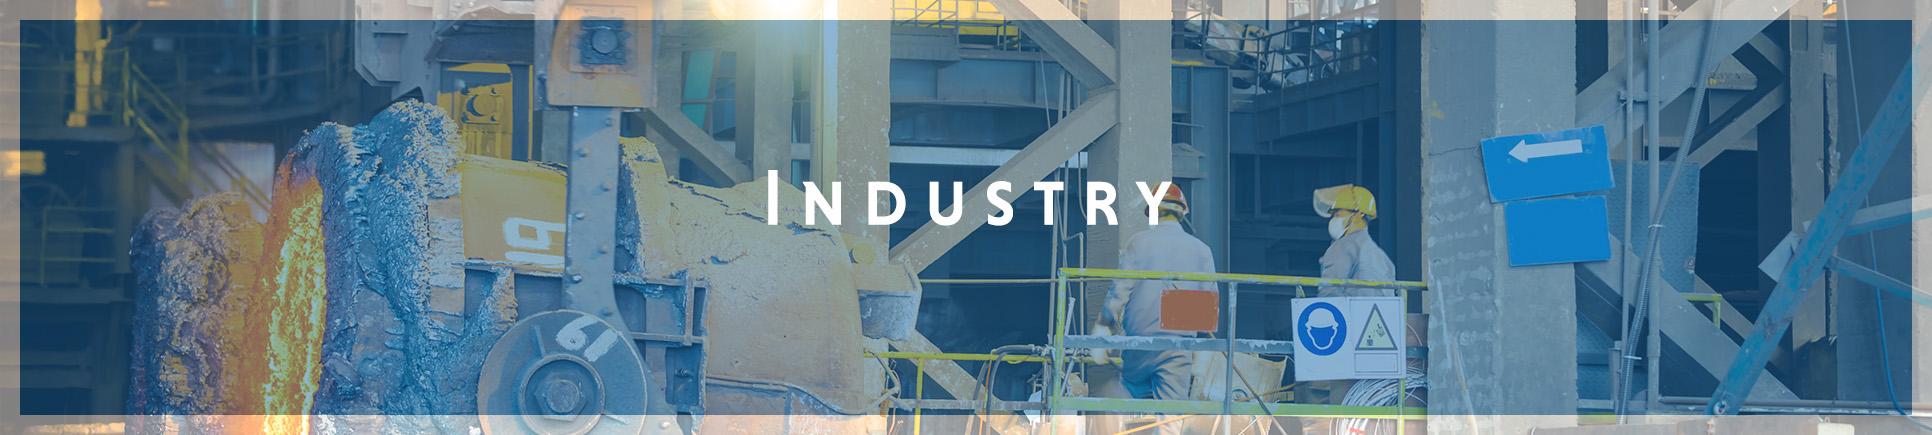 Industry - Teeo